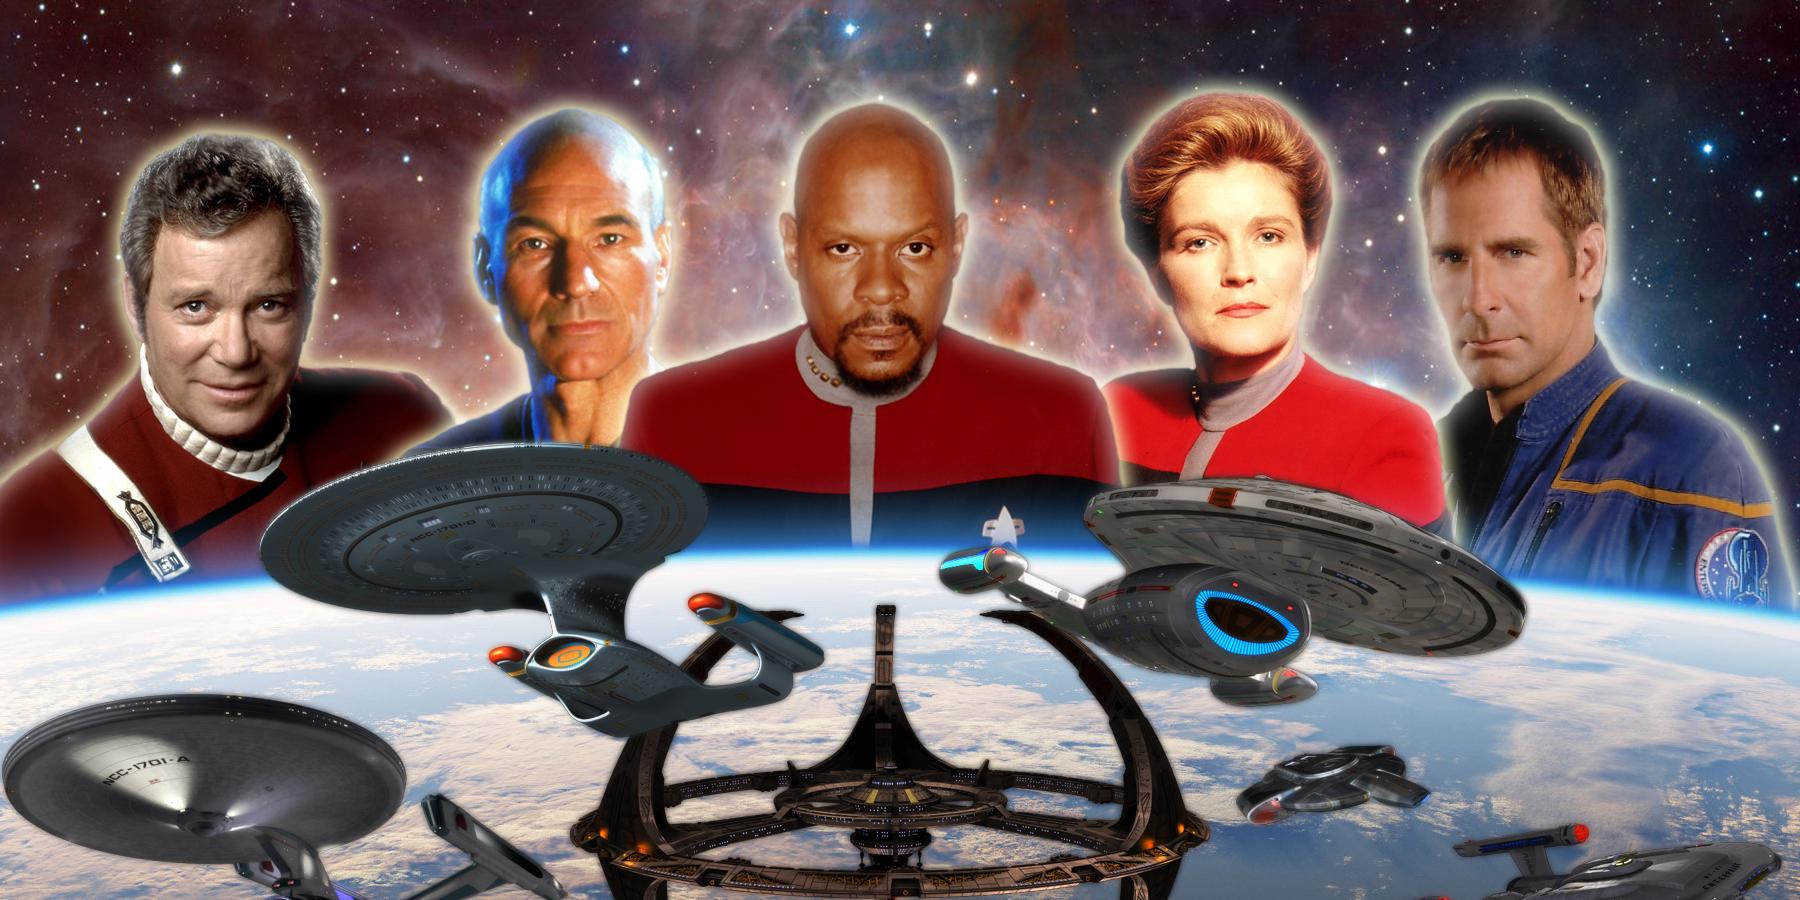 Star Trek Backgrounds, Compatible - PC, Mobile, Gadgets| 1800x900 px